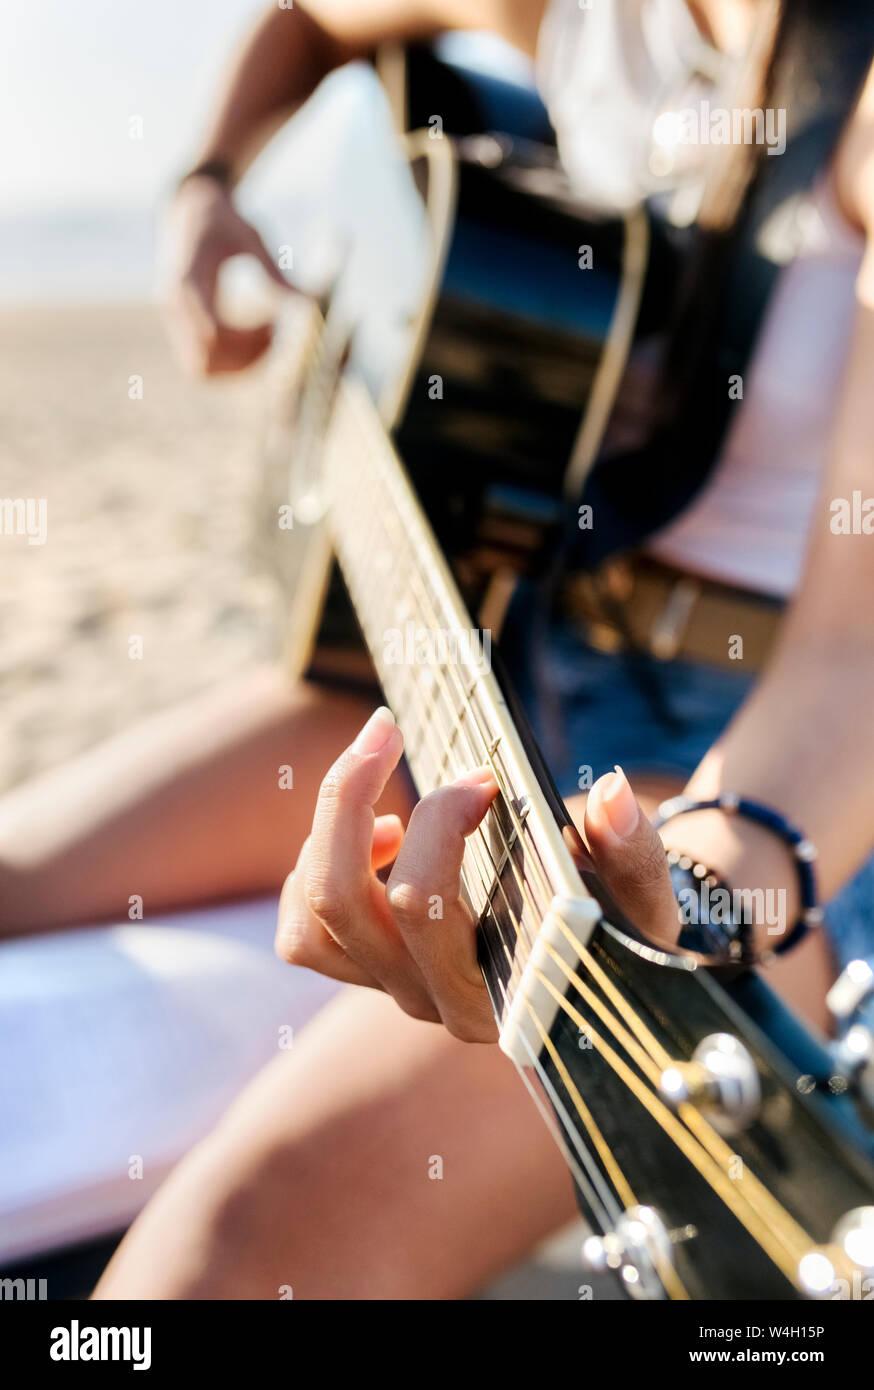 Close-up of young woman playing guitar sur la plage Banque D'Images